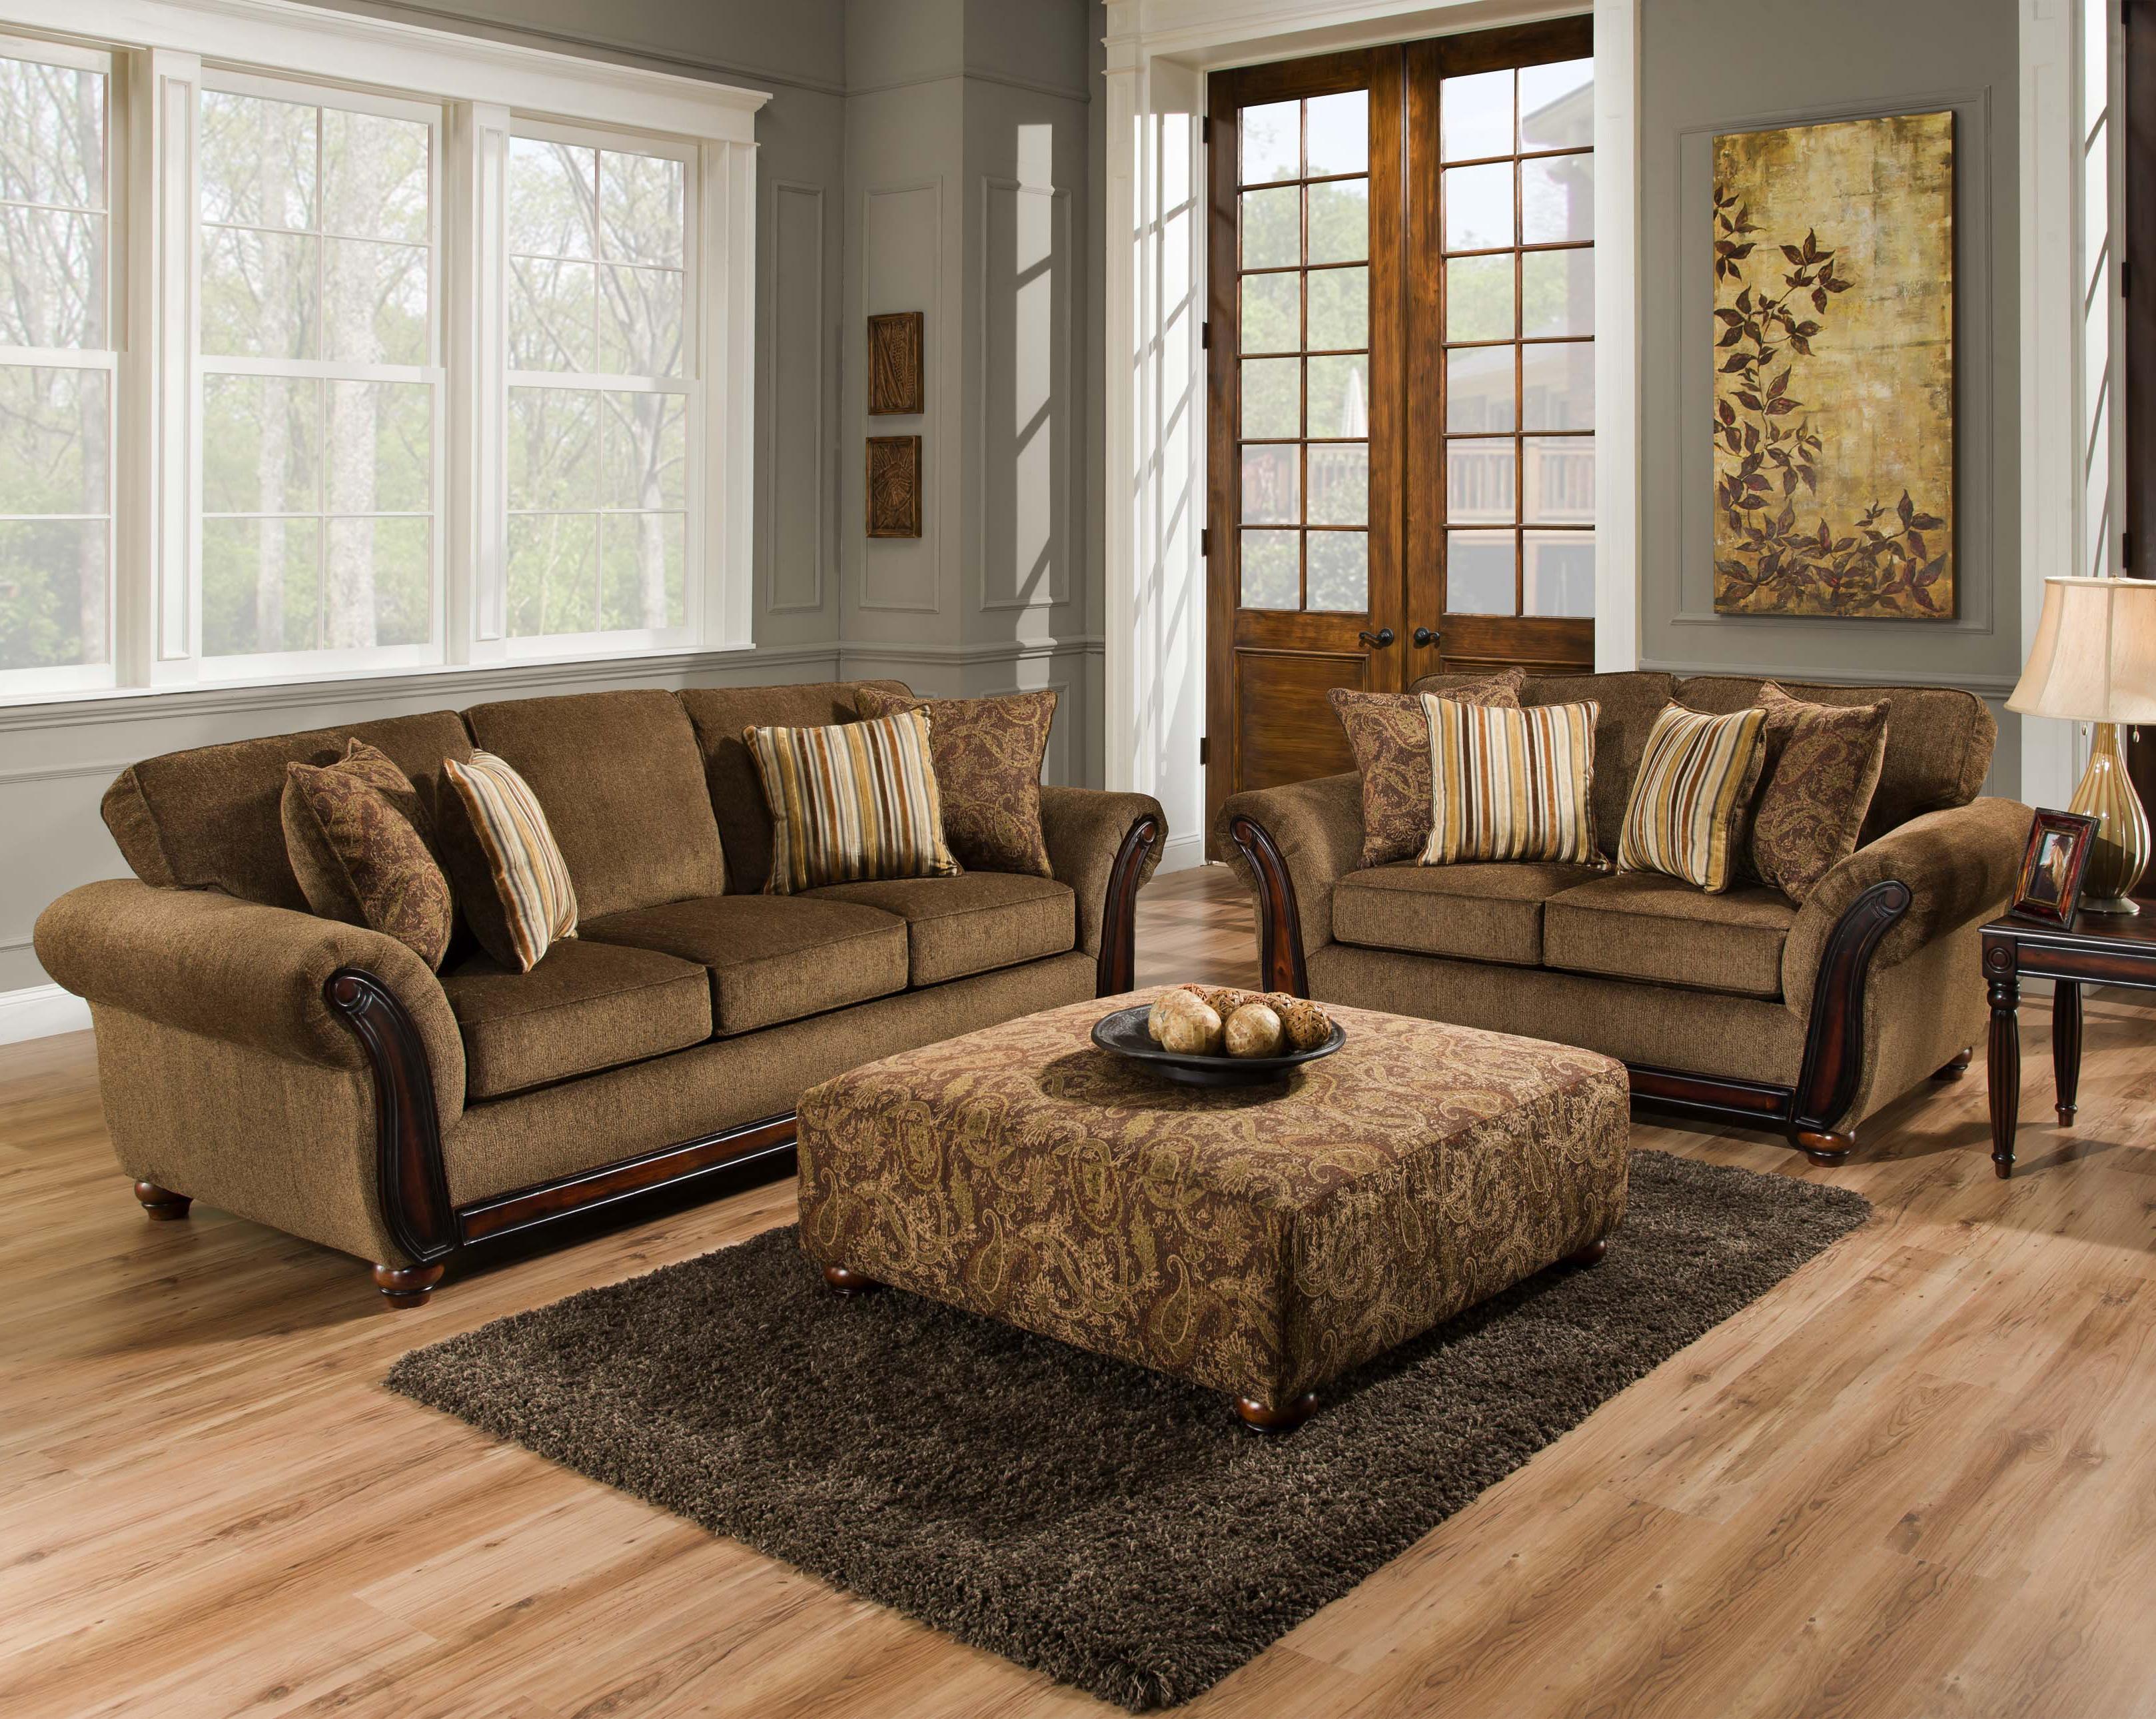 American Furniture 5650 Stationary Living Room Group Furniture Fair North Carolina